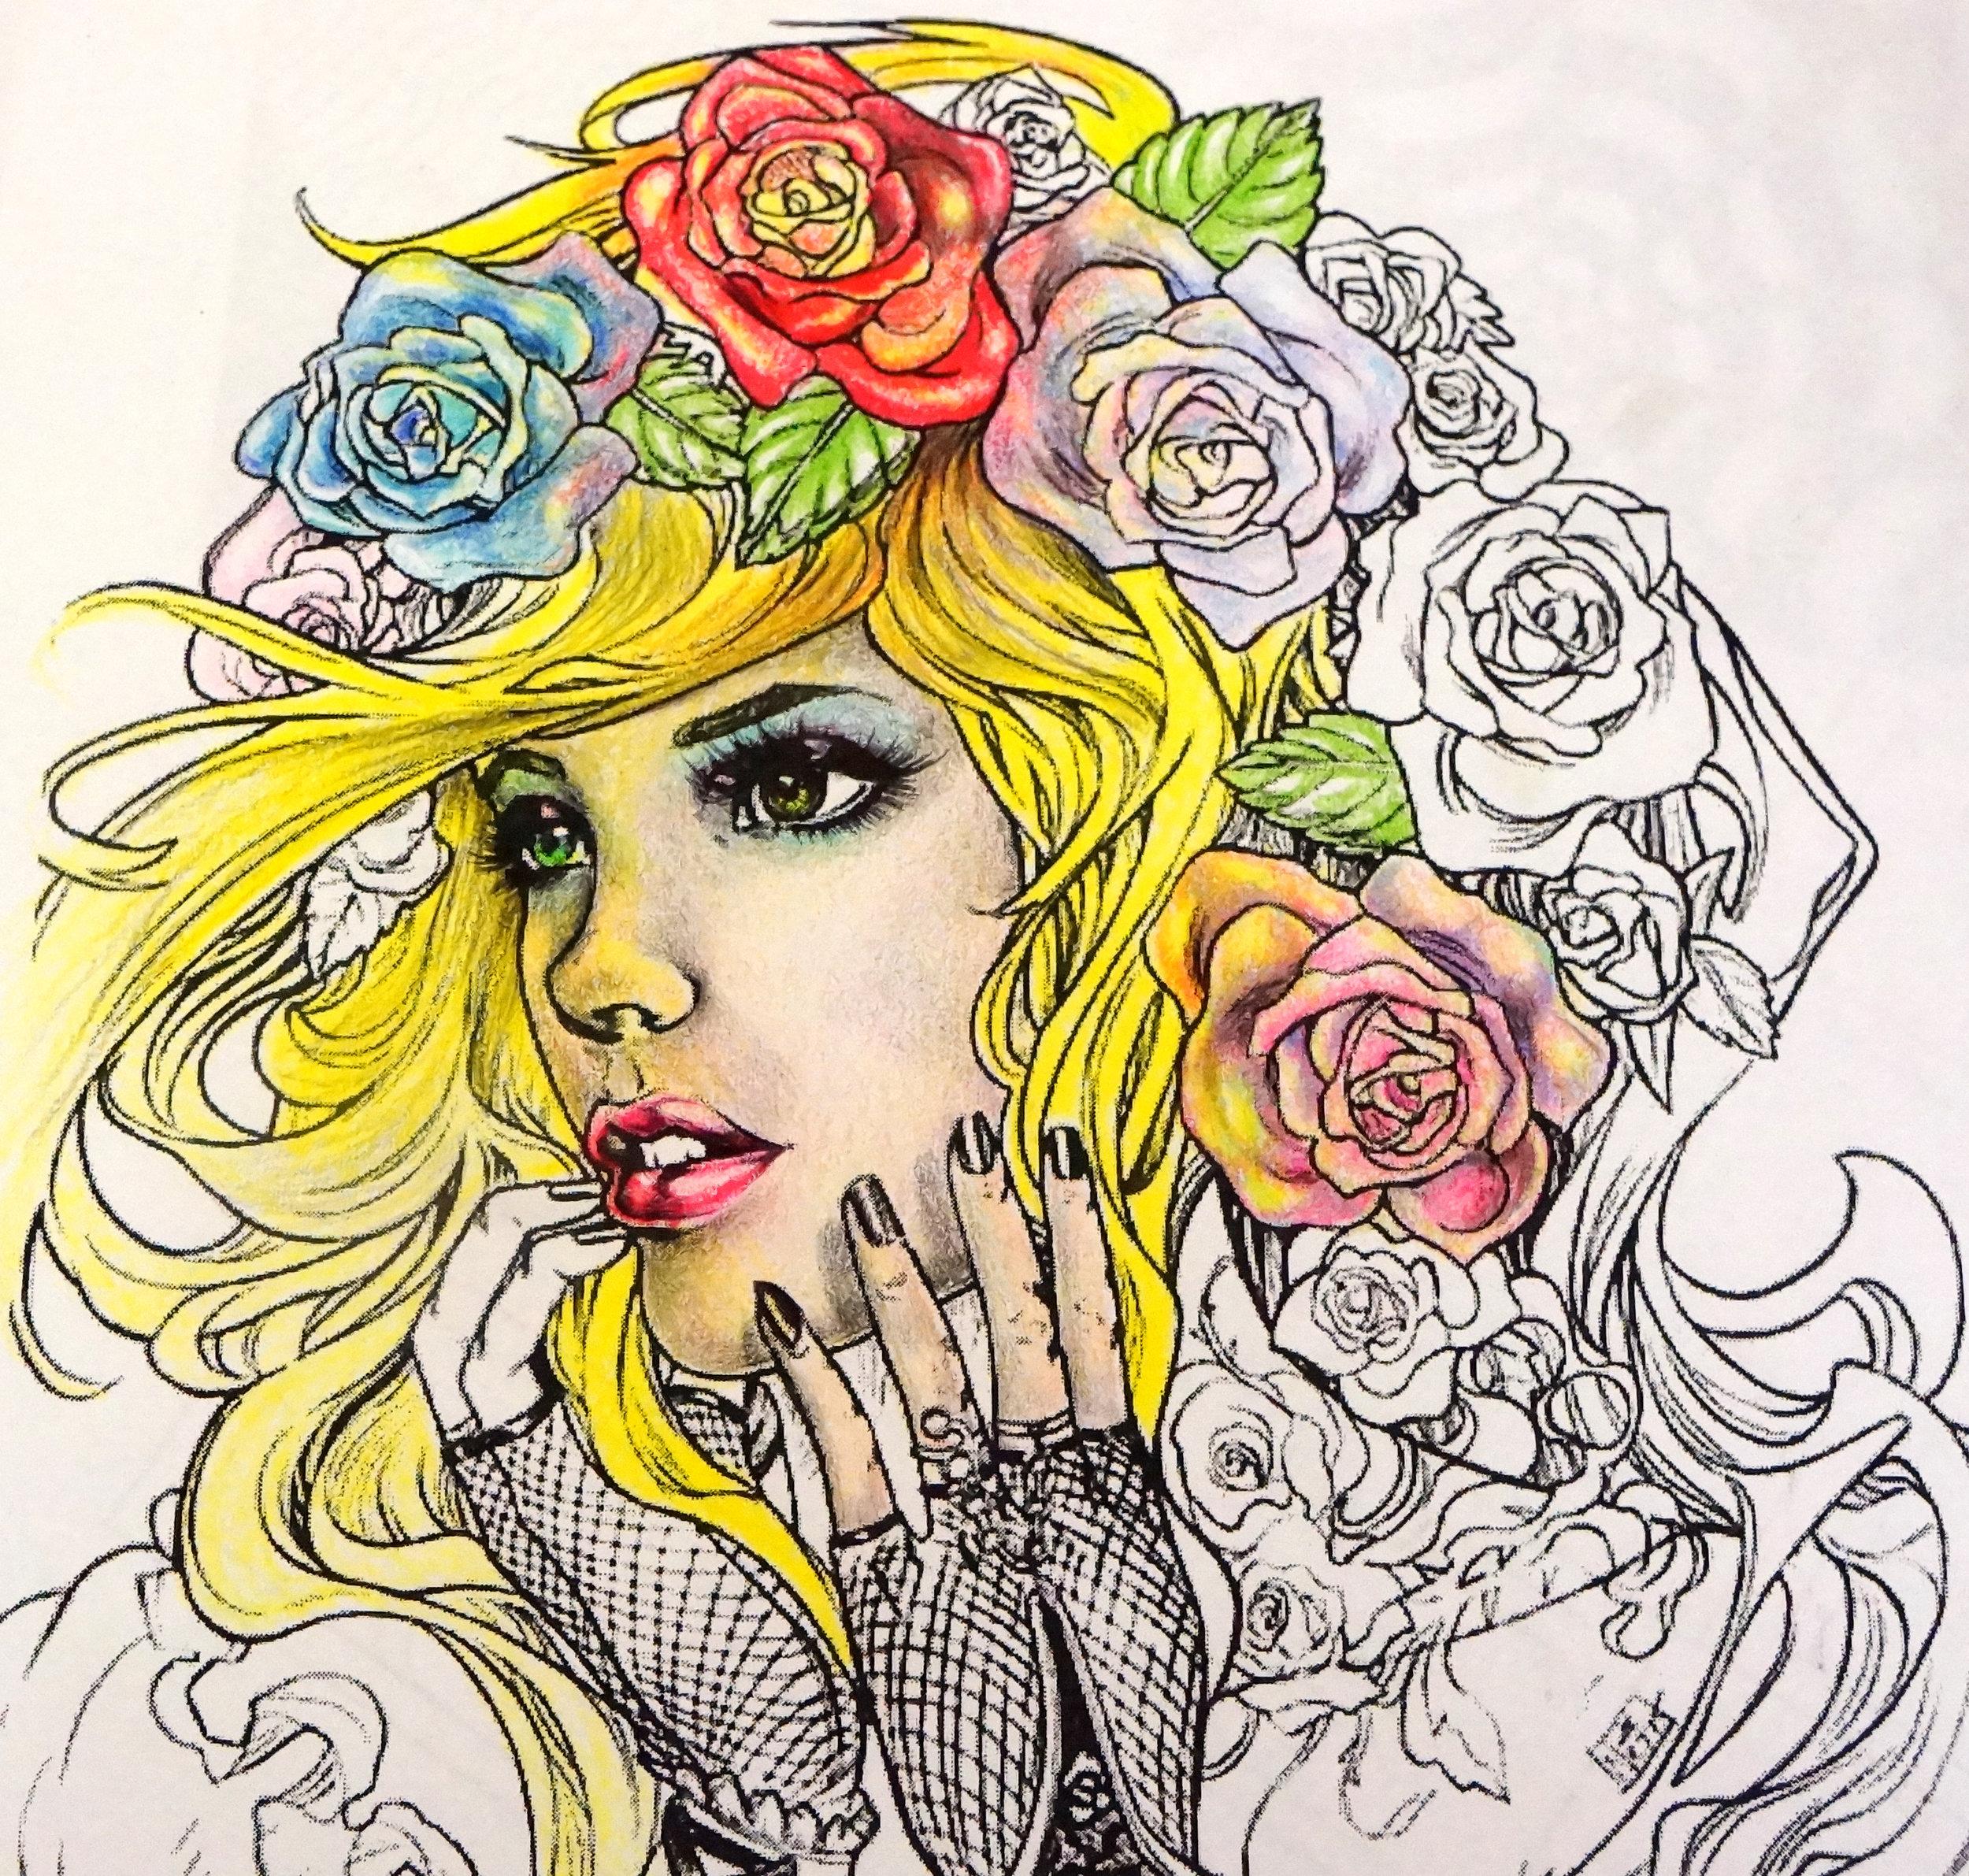 Artist: Chris